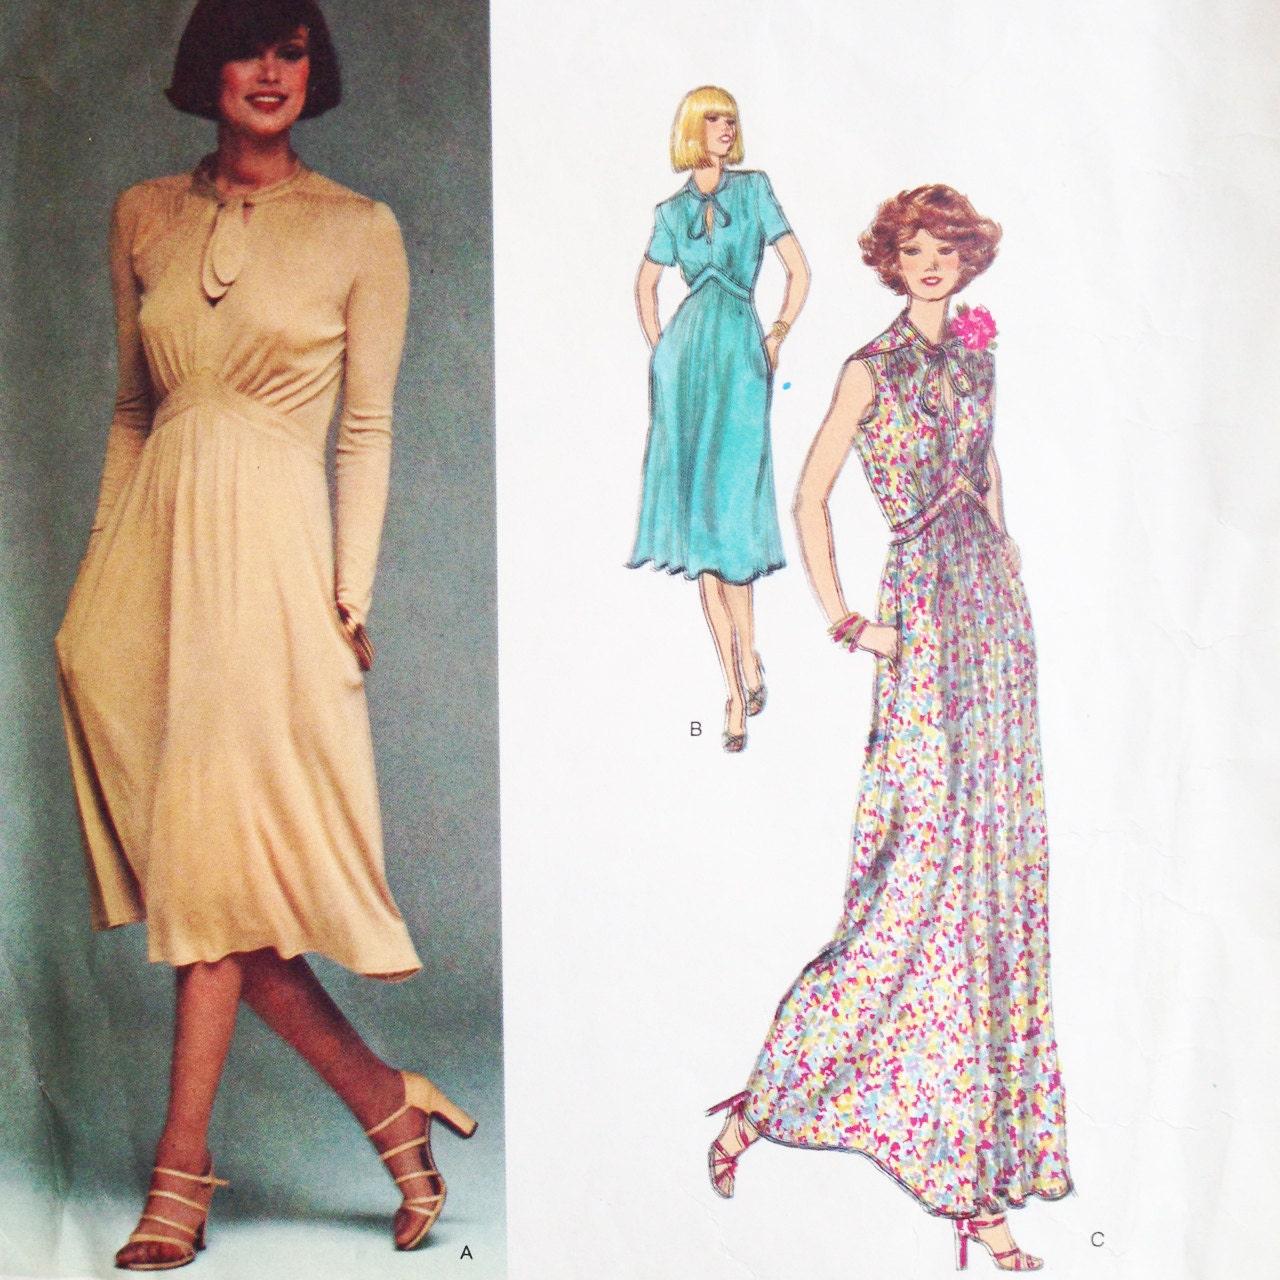 Vintage vogue french boutique sewing pattern renata 80s dress details pattern jeuxipadfo Image collections